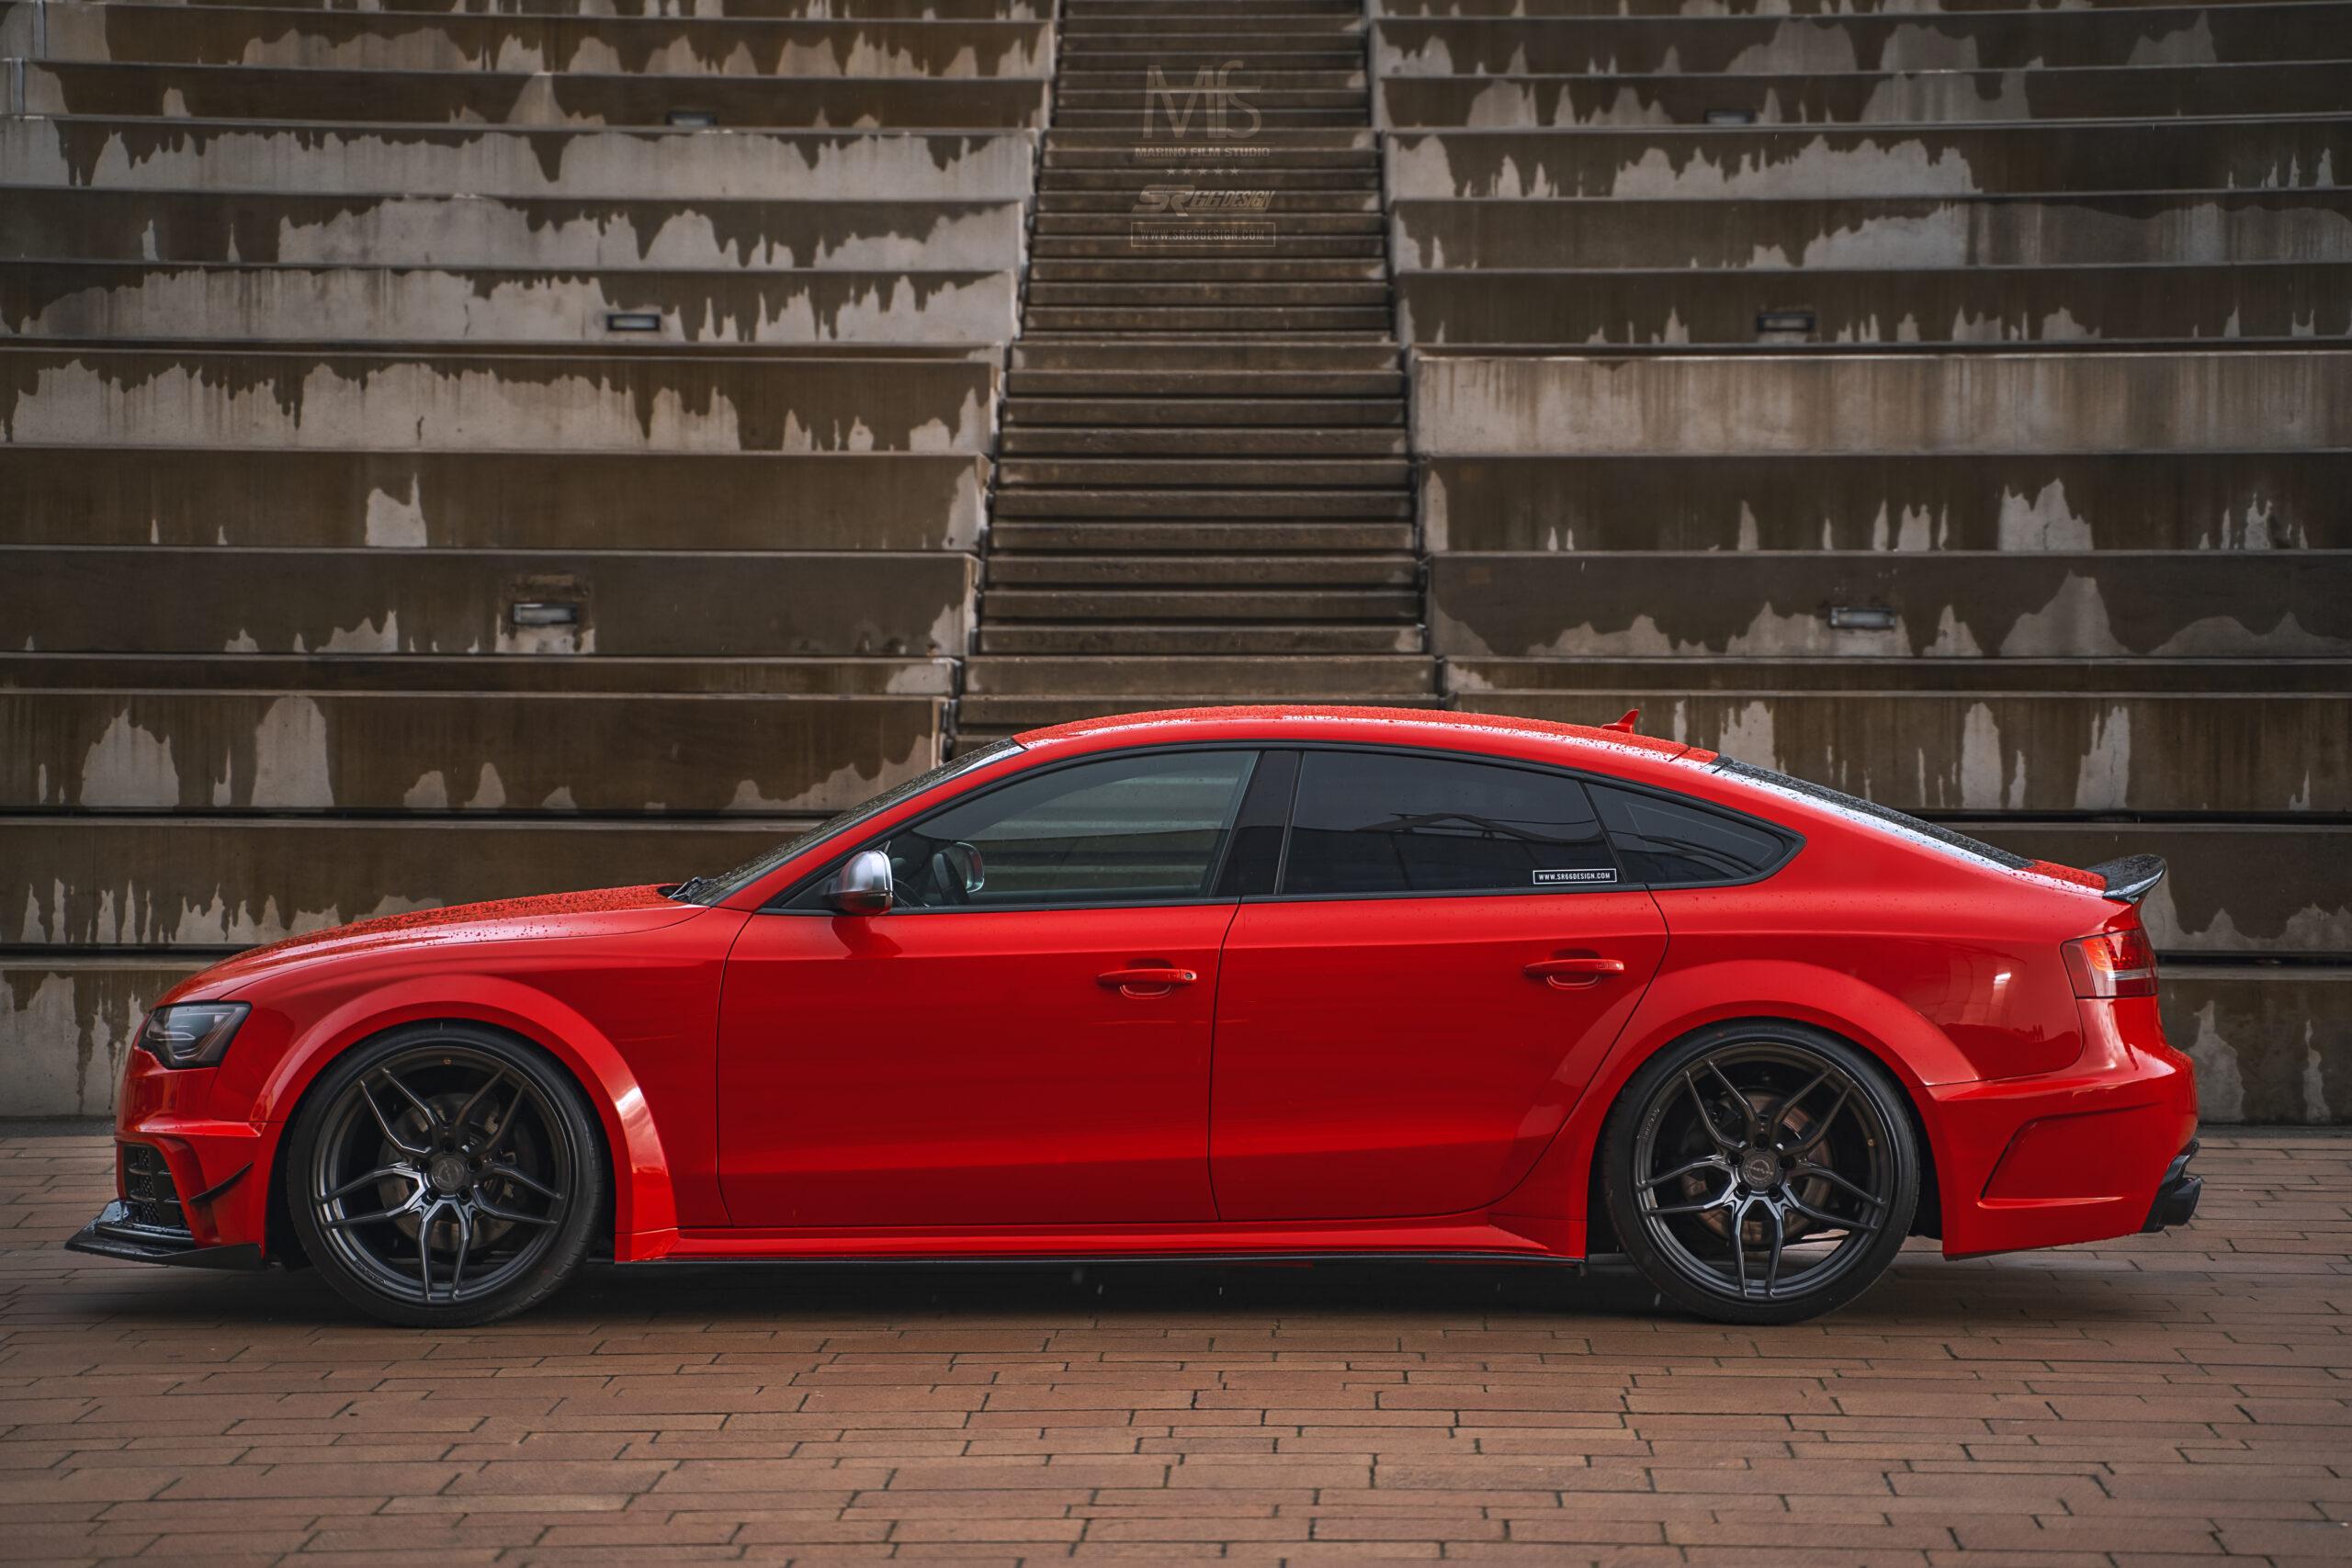 Audi A5 S5 Sportback (8T, B8, B8.5) SR66 wide body kit